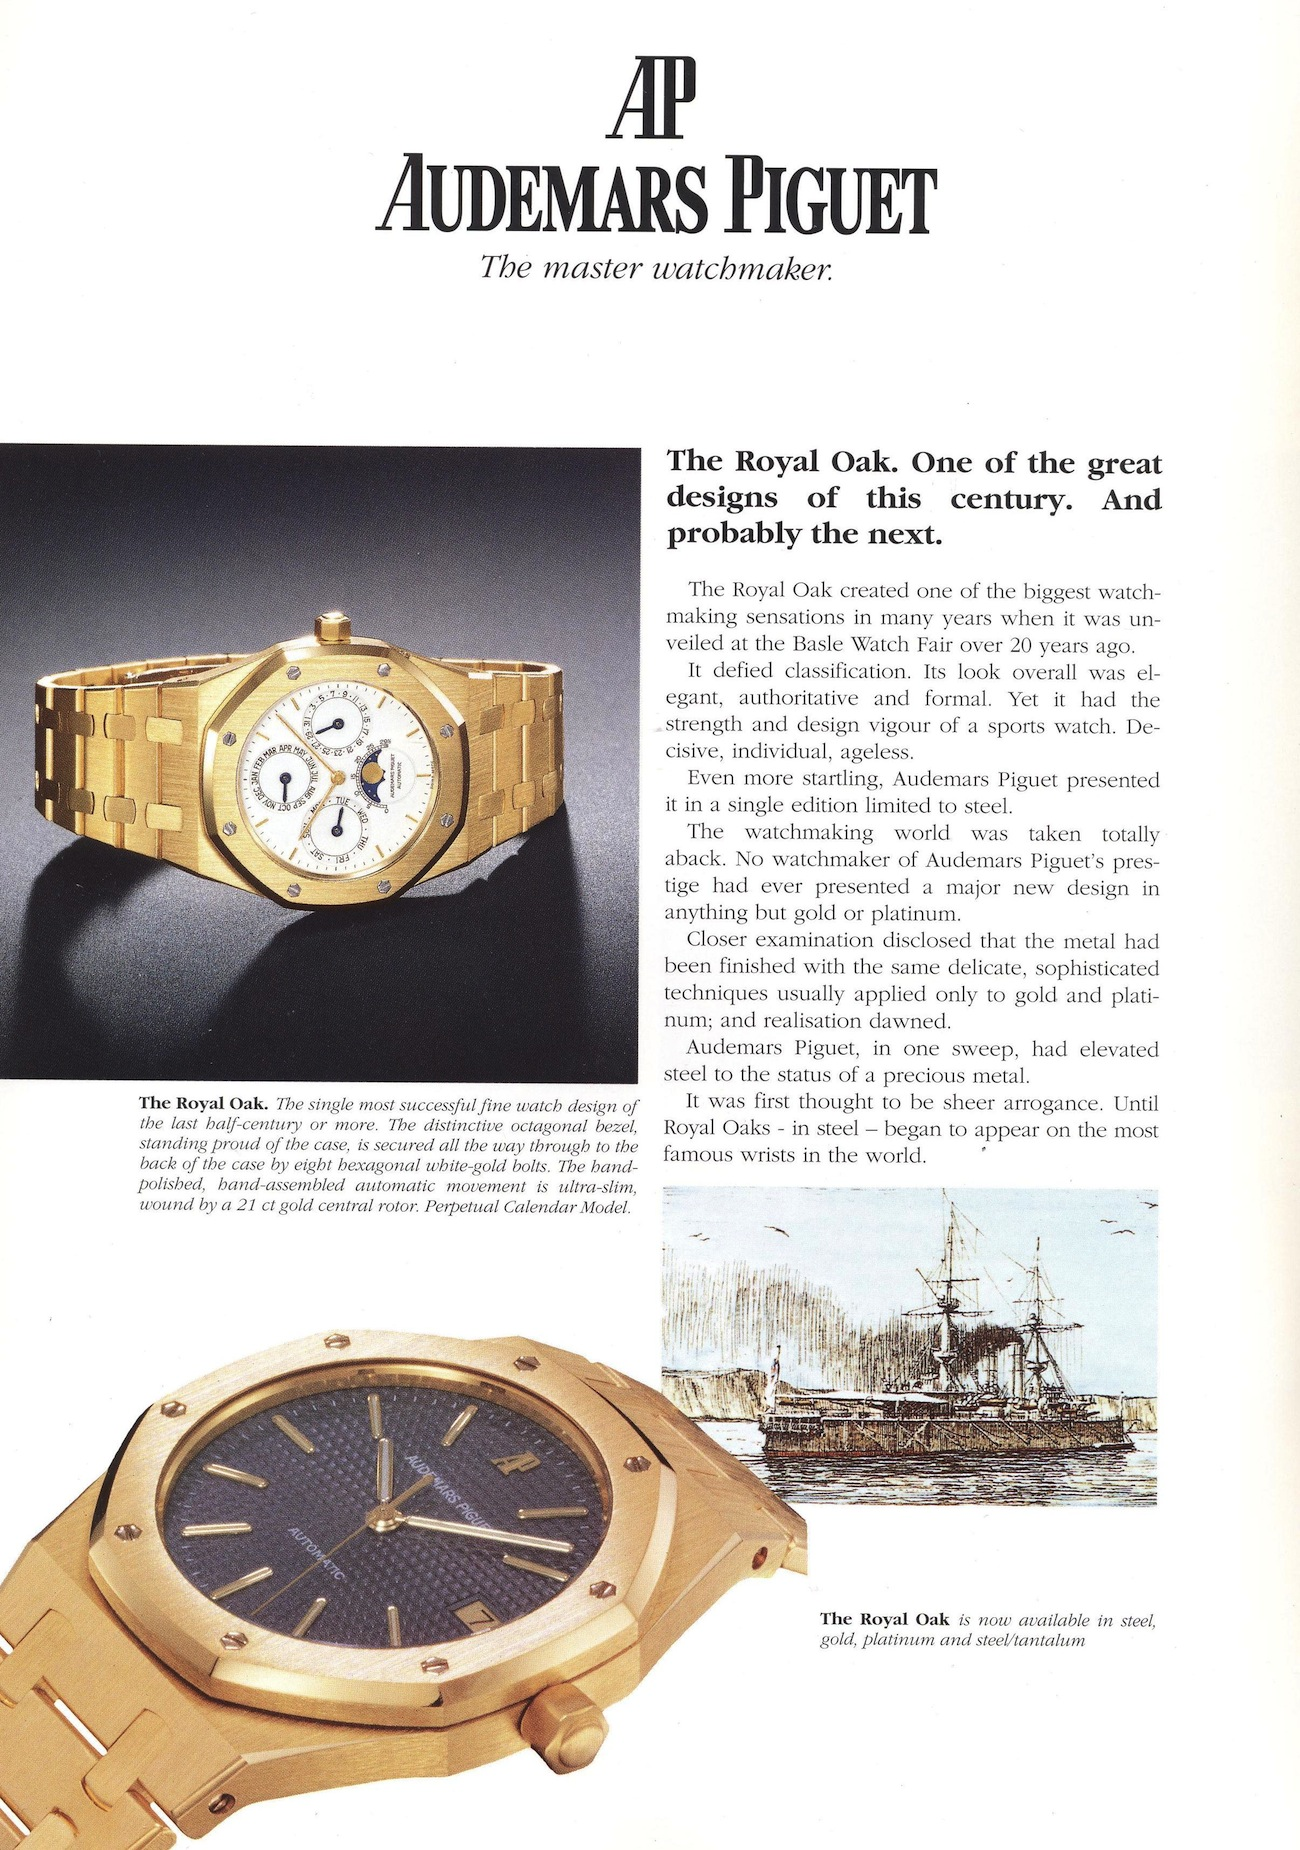 Royal Oak Advertisement circa 1992.